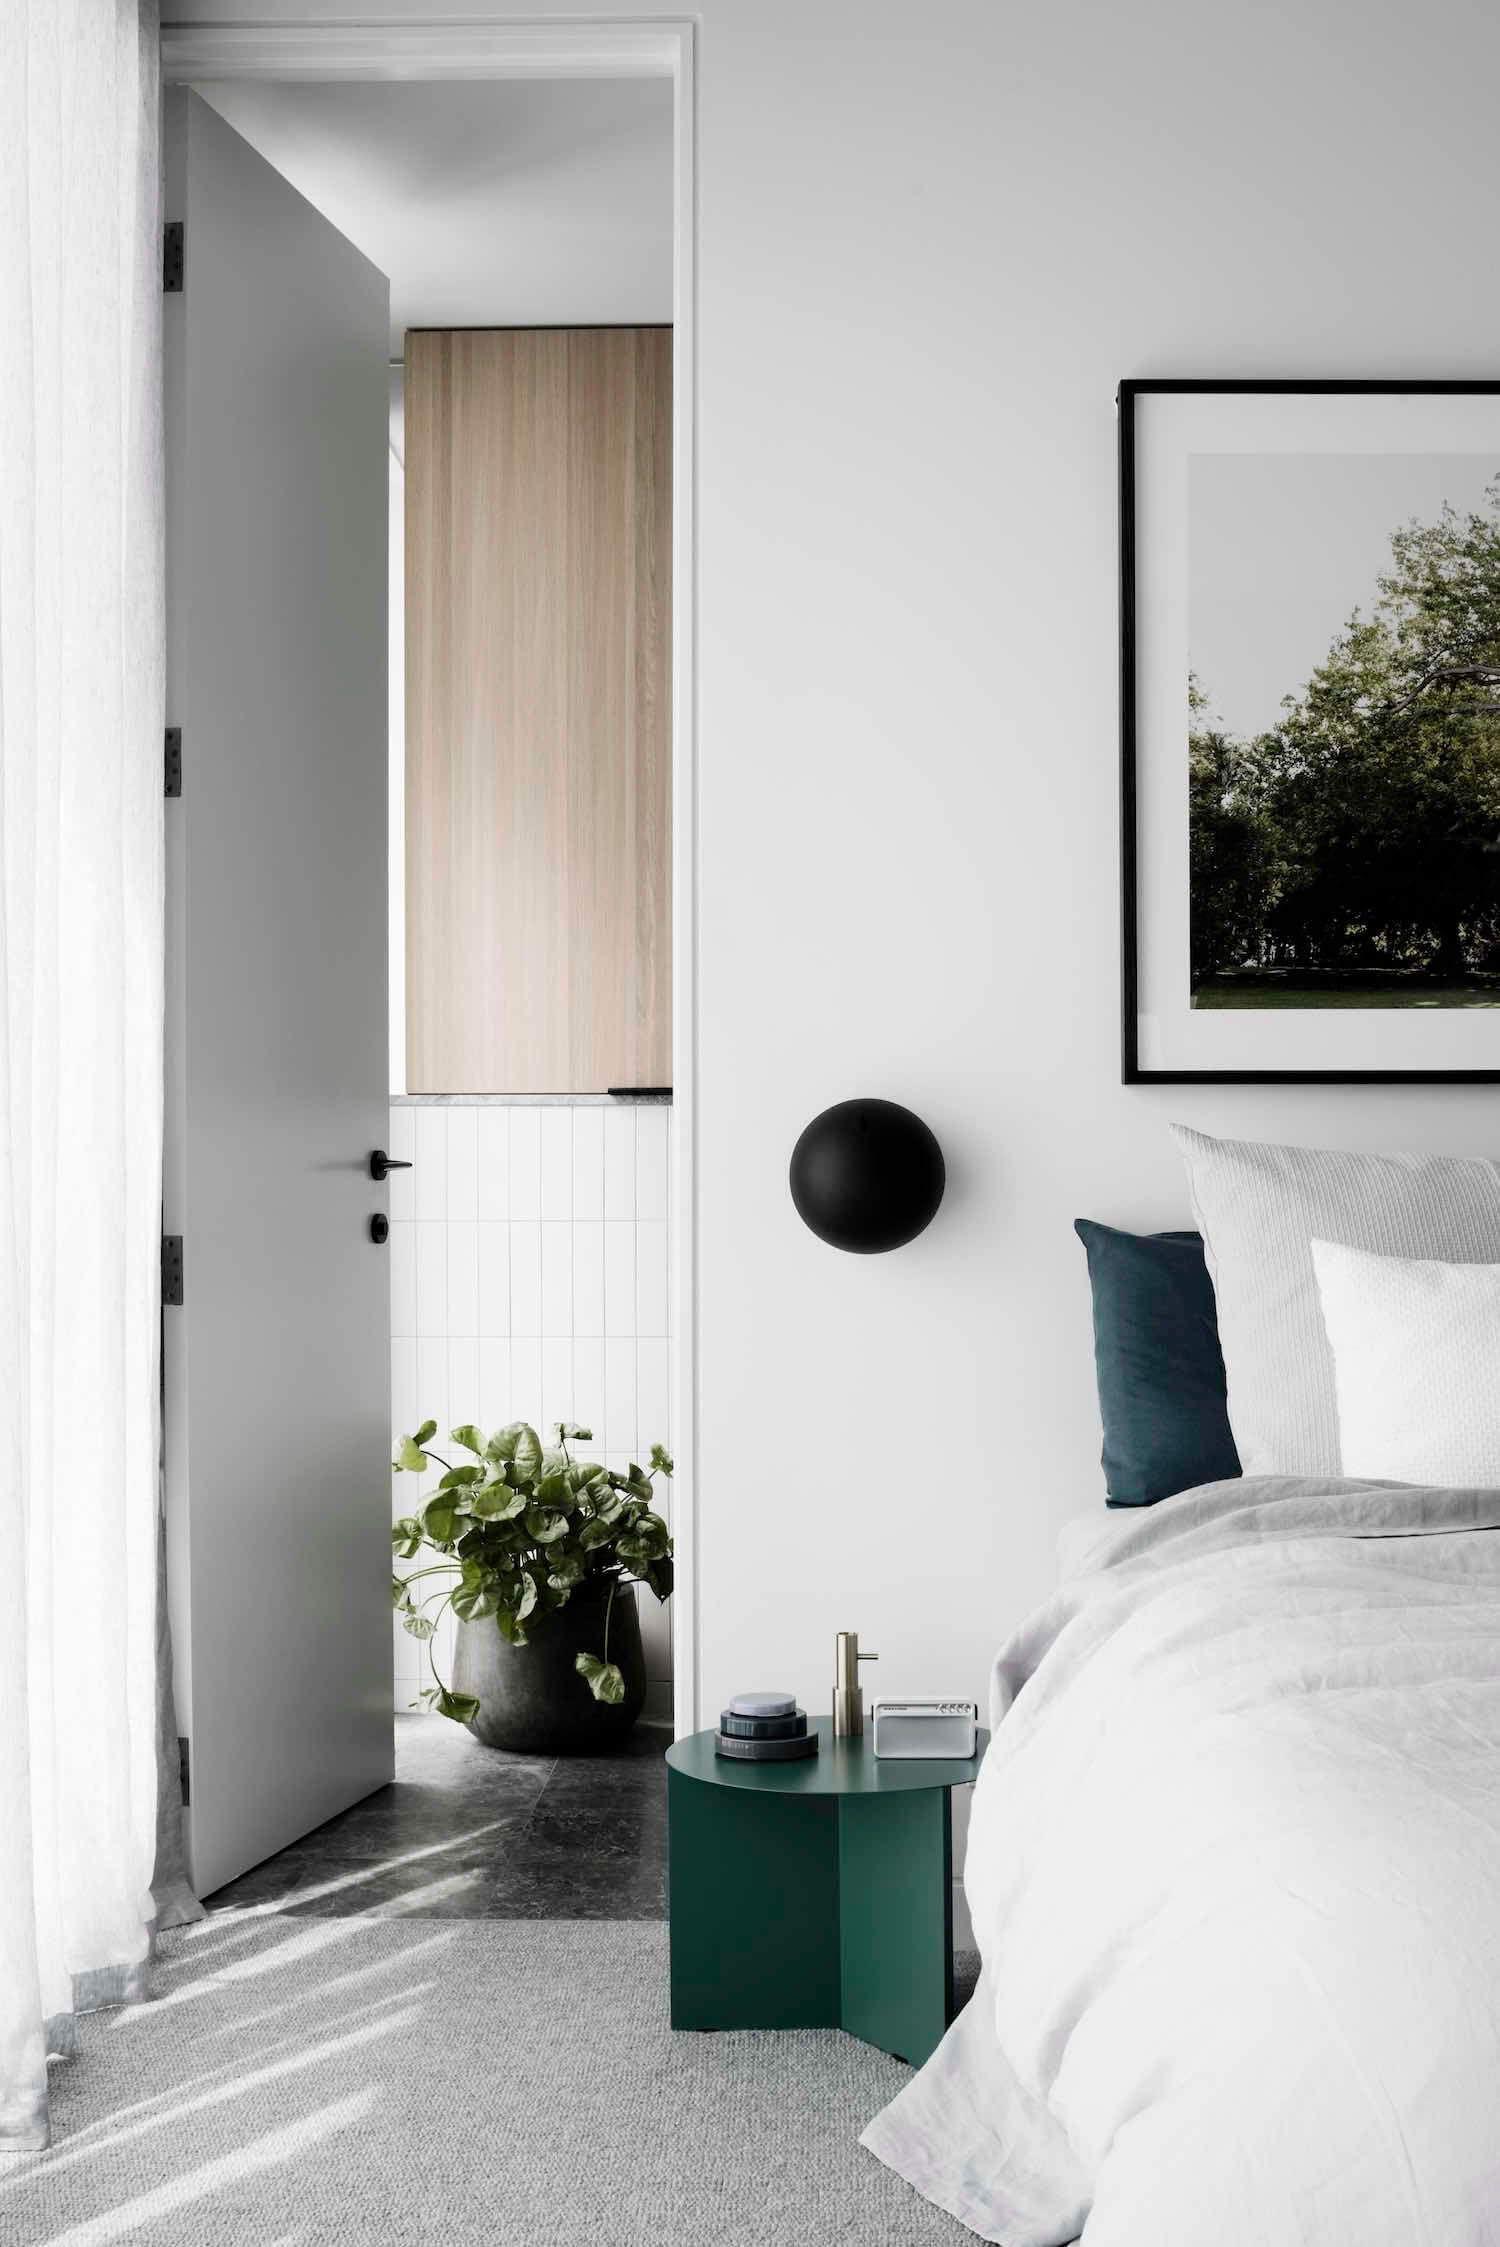 Schlafzimmer Ideen Blog | Etre Living Blog For The Home Pinterest Schlafzimmer